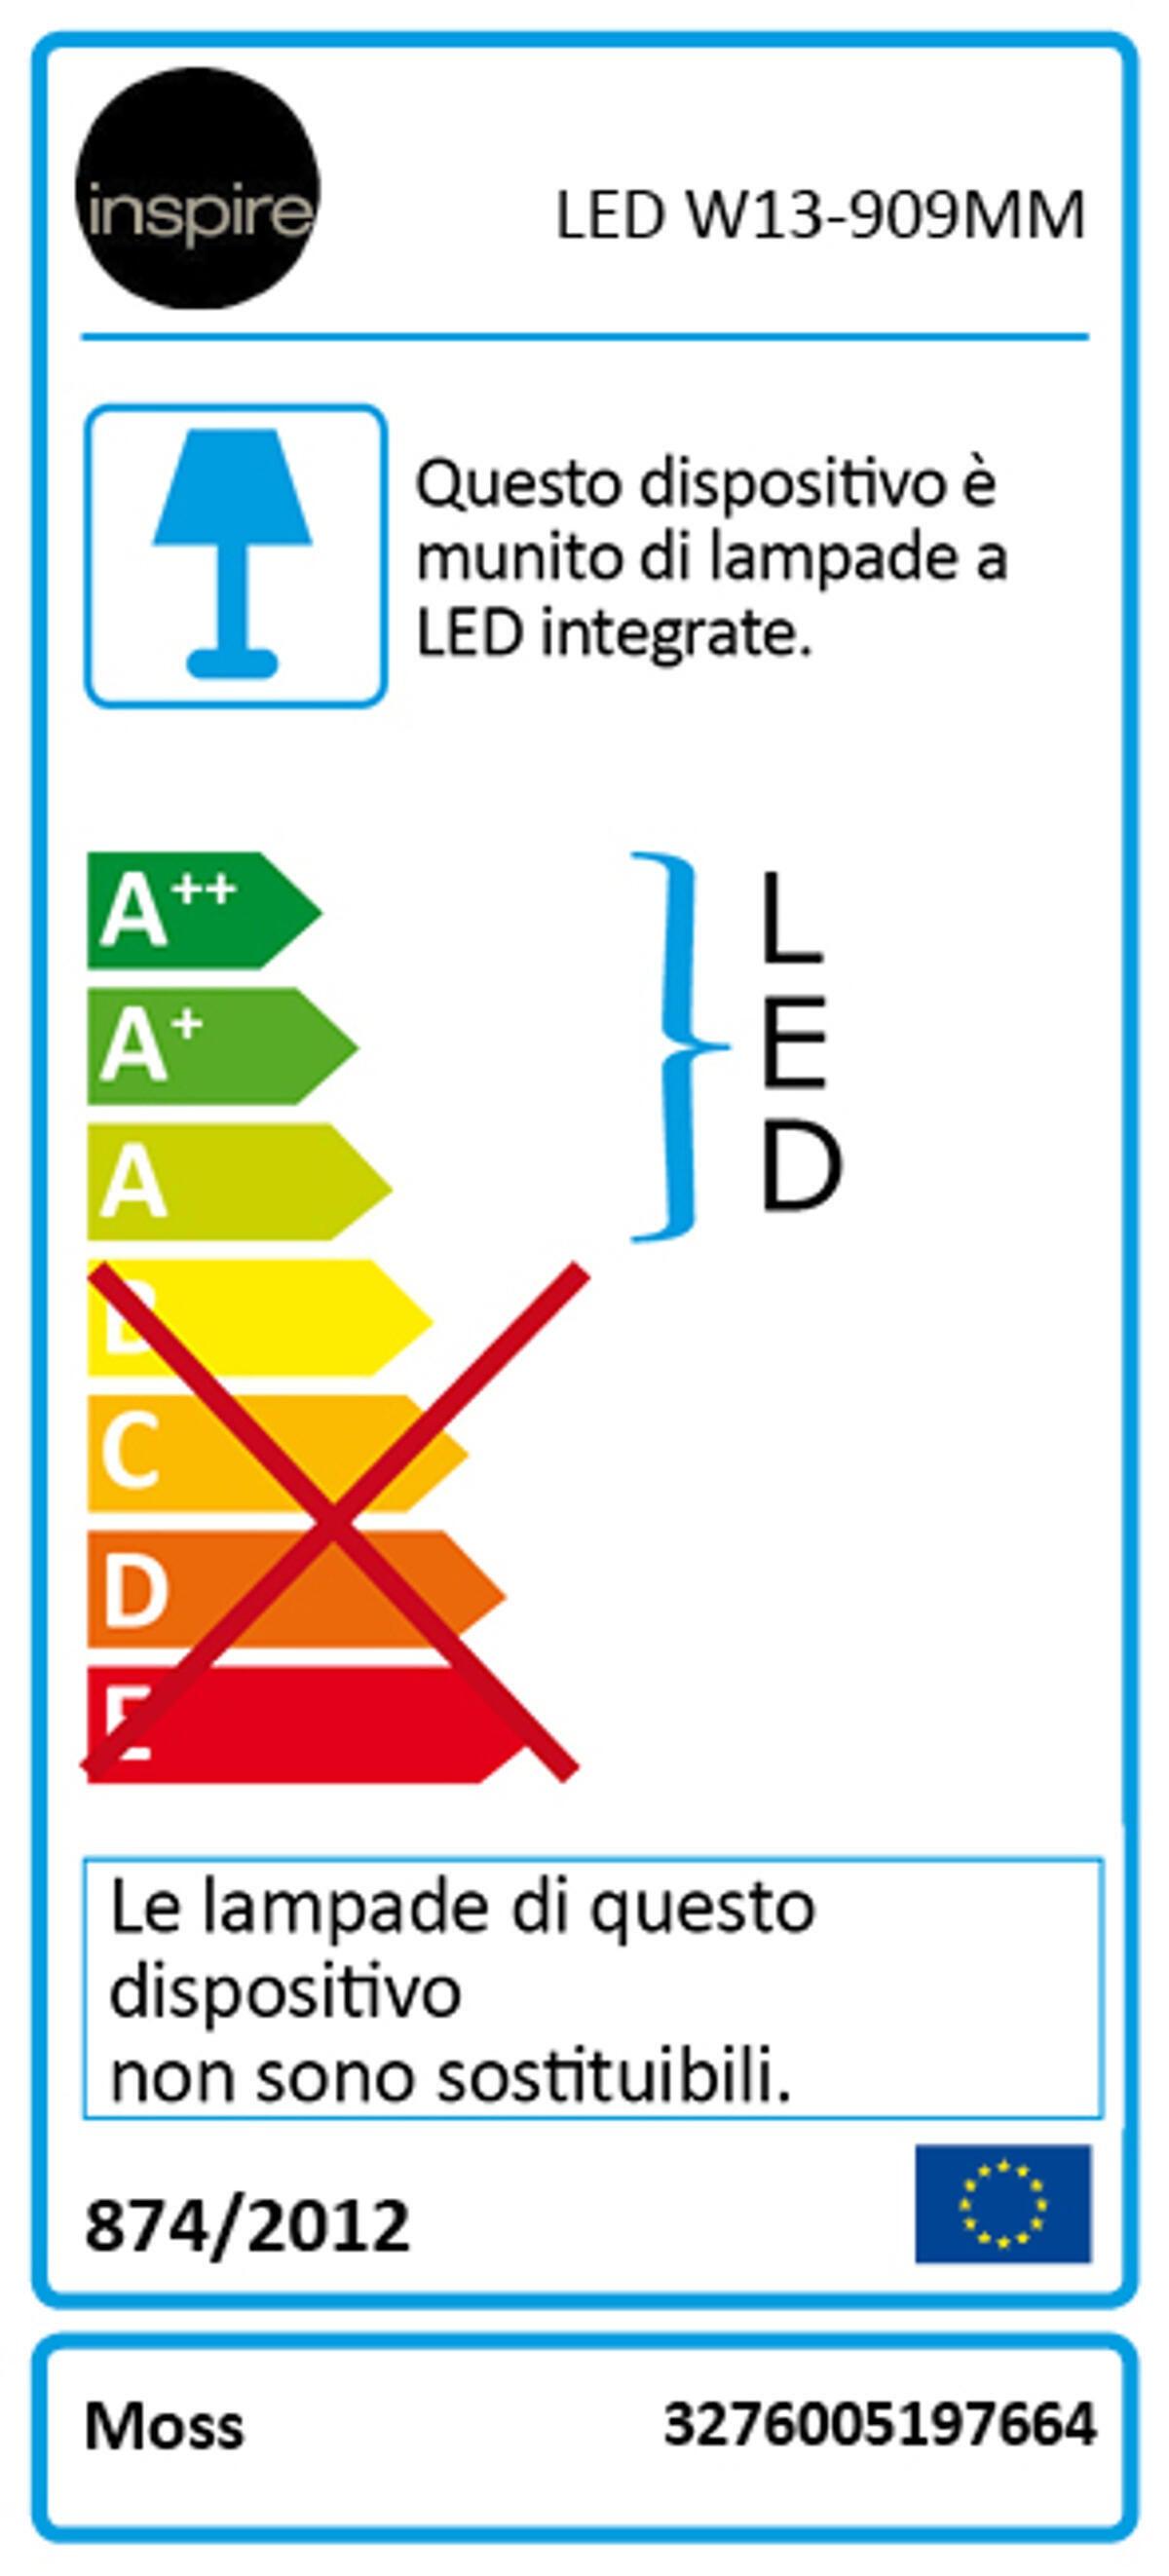 Reglette Moss LED integrato 90.9 cm 11W 1250LM IP20 Inspire - 2